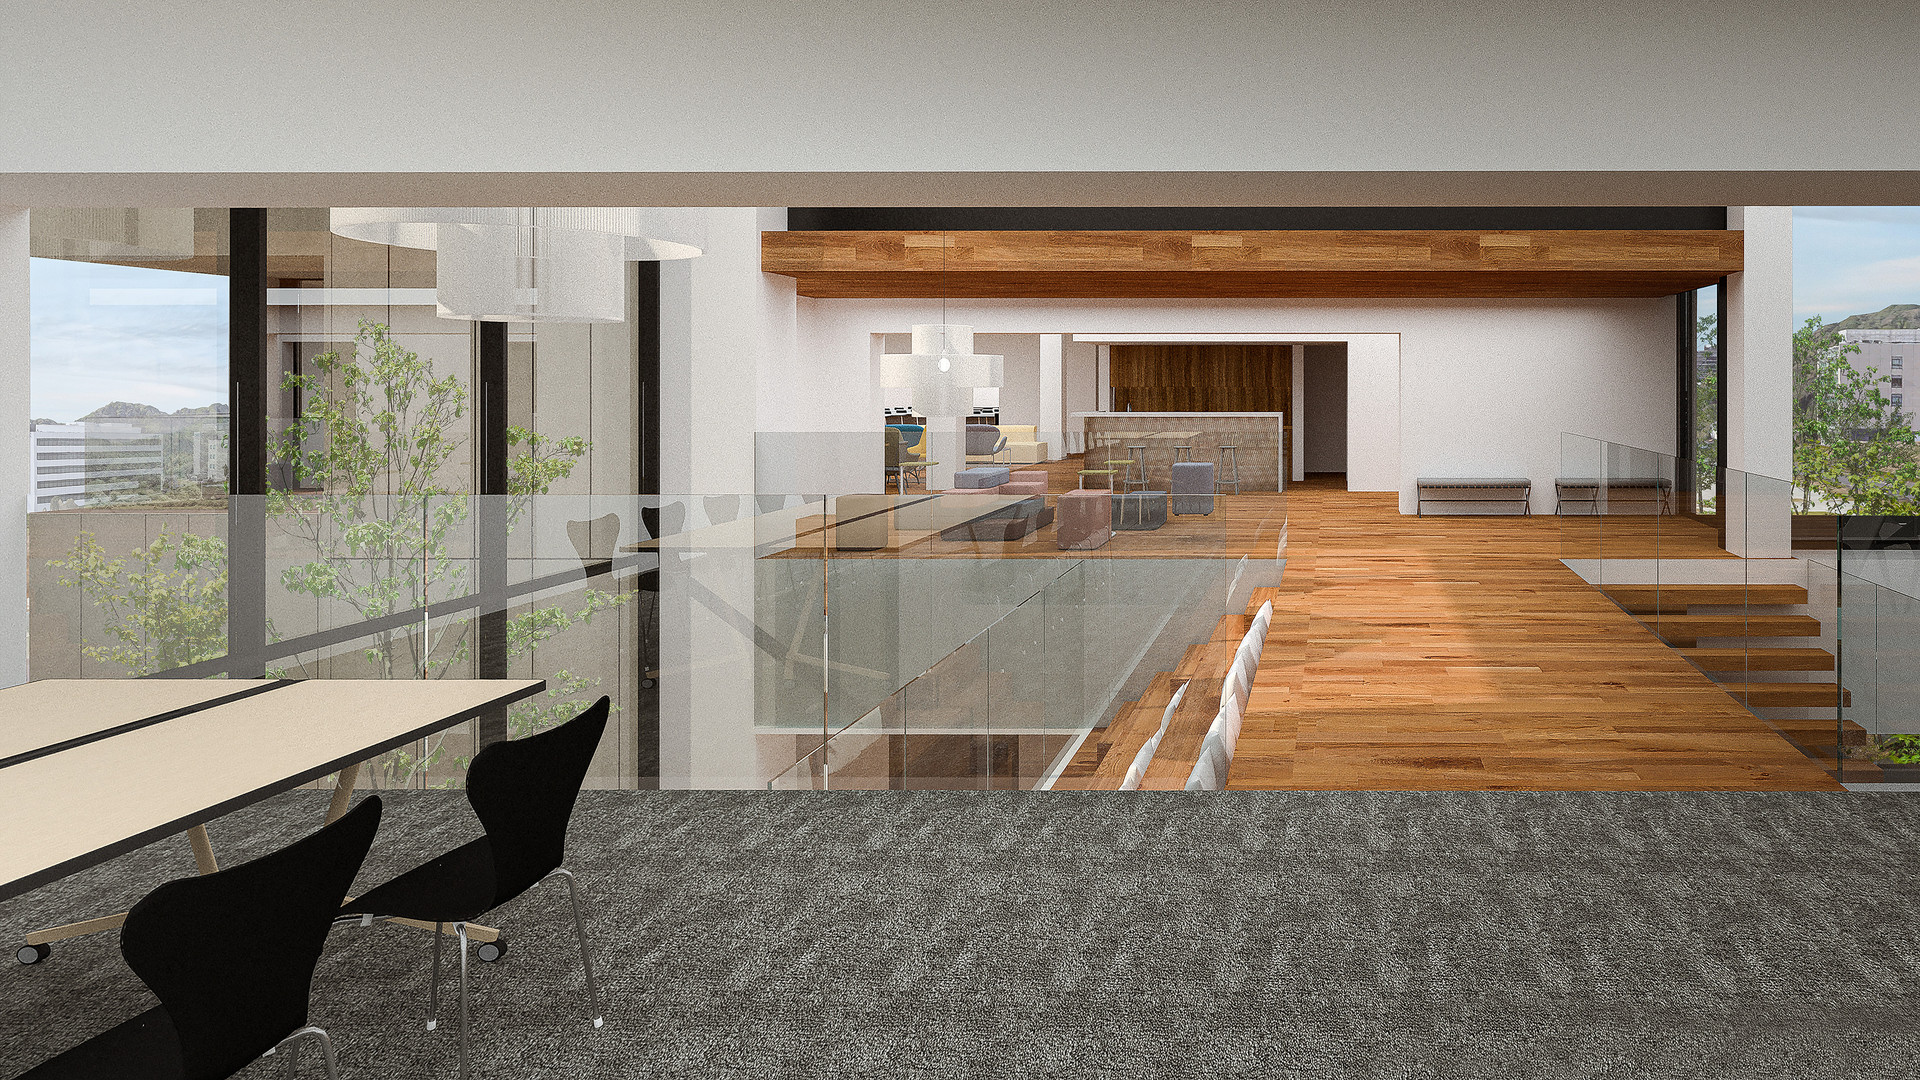 interior-1_resize.jpg